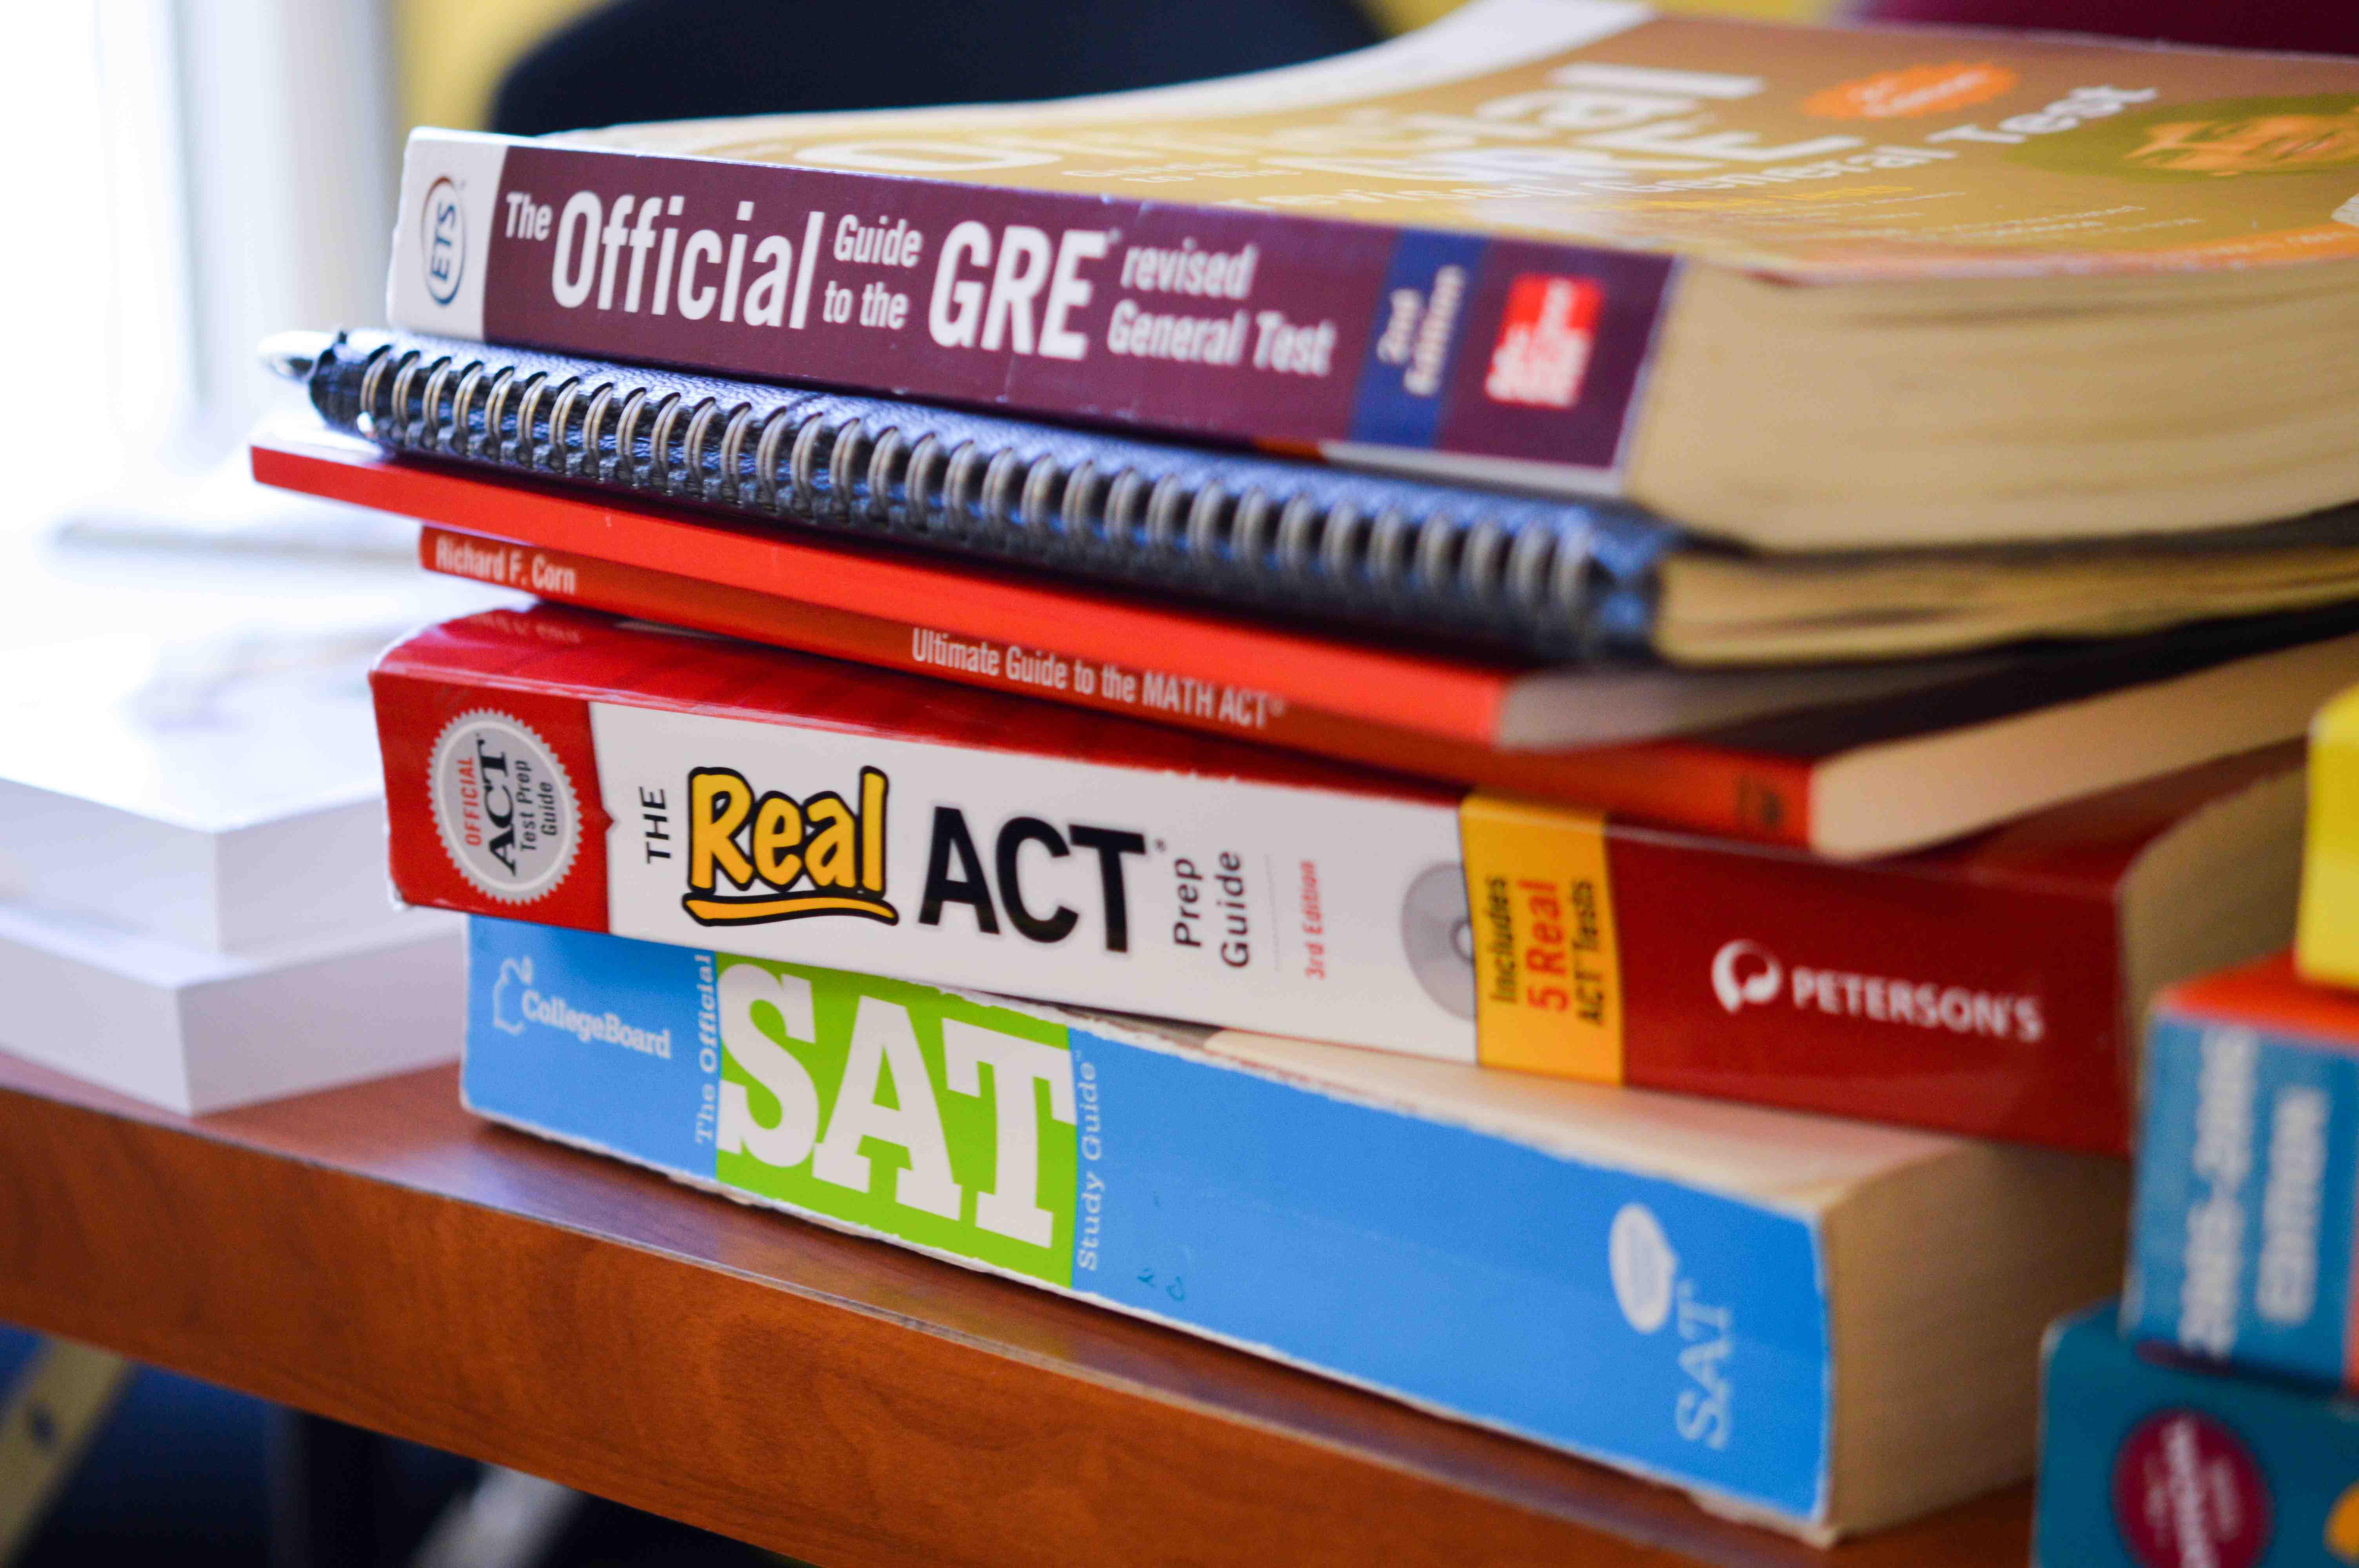 SAT, ACT, LSAT, GRE, GMAT & more : McElroy Tutoring